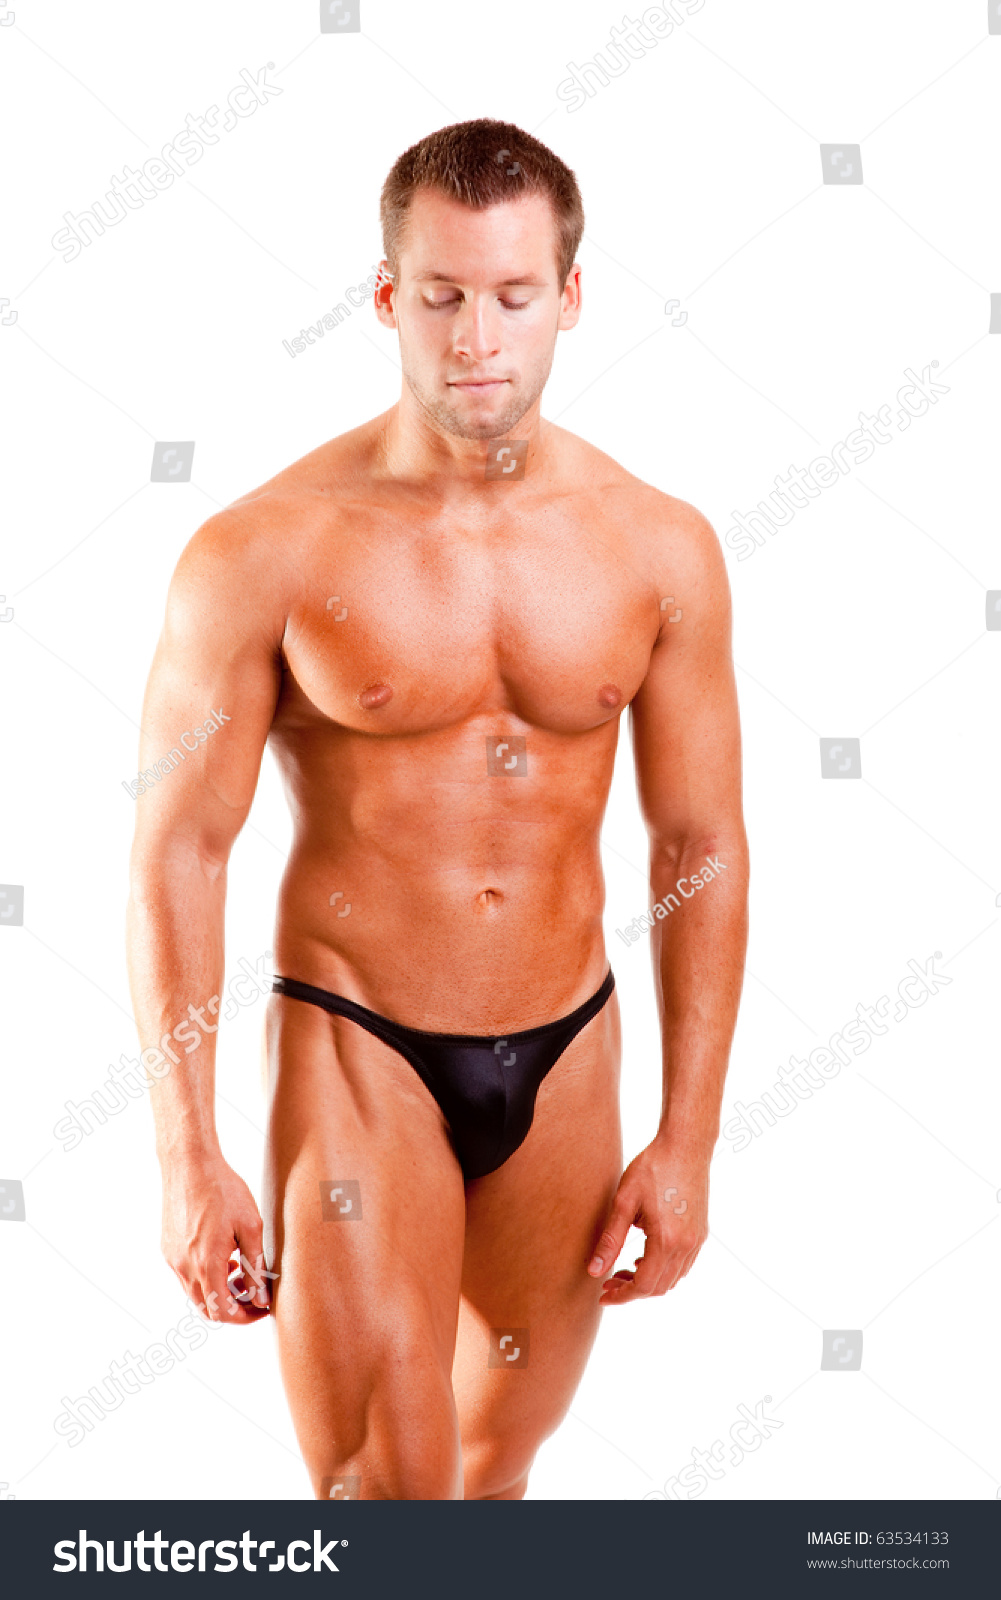 Cariba heine bikini